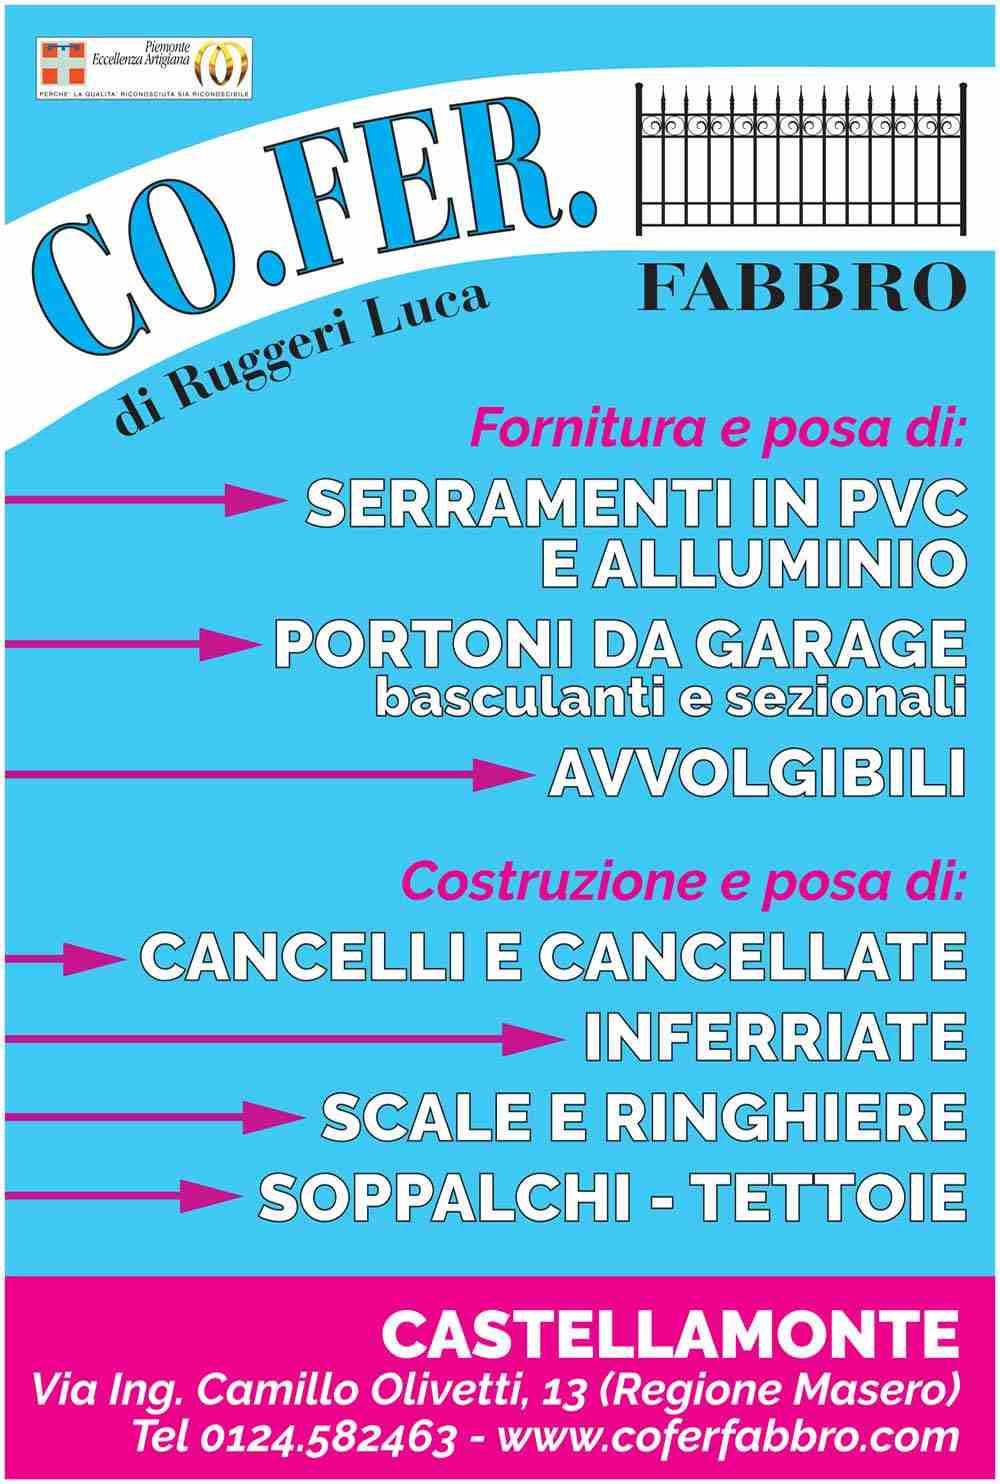 cofer1